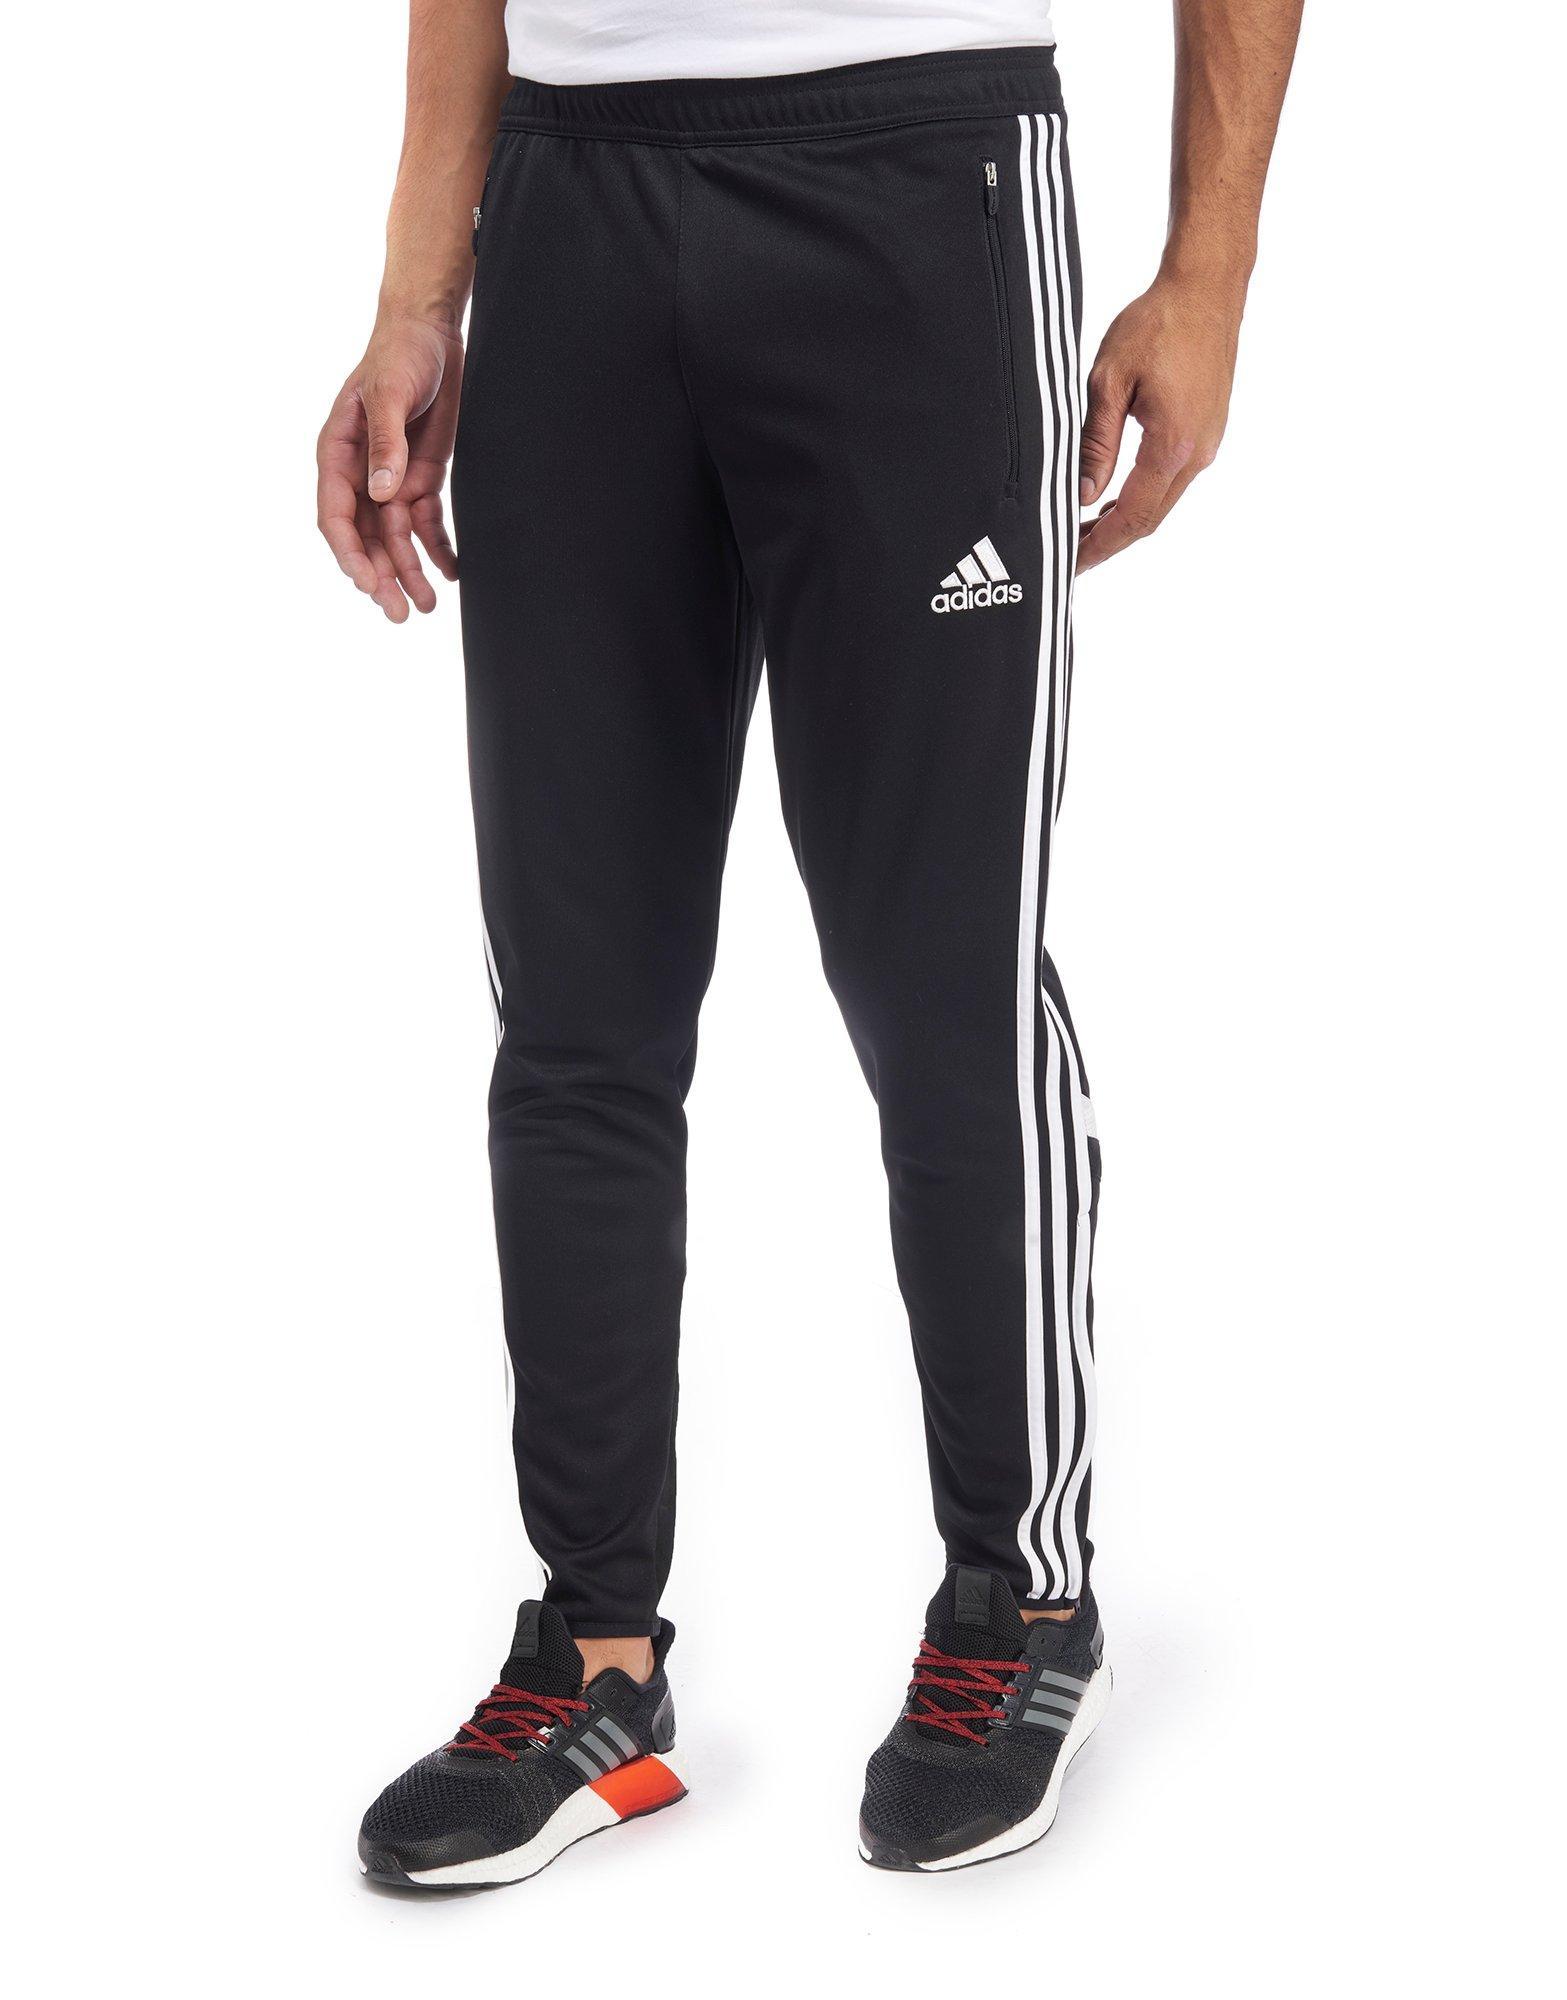 Fashion  Uk Adidas Jogging Bottoms